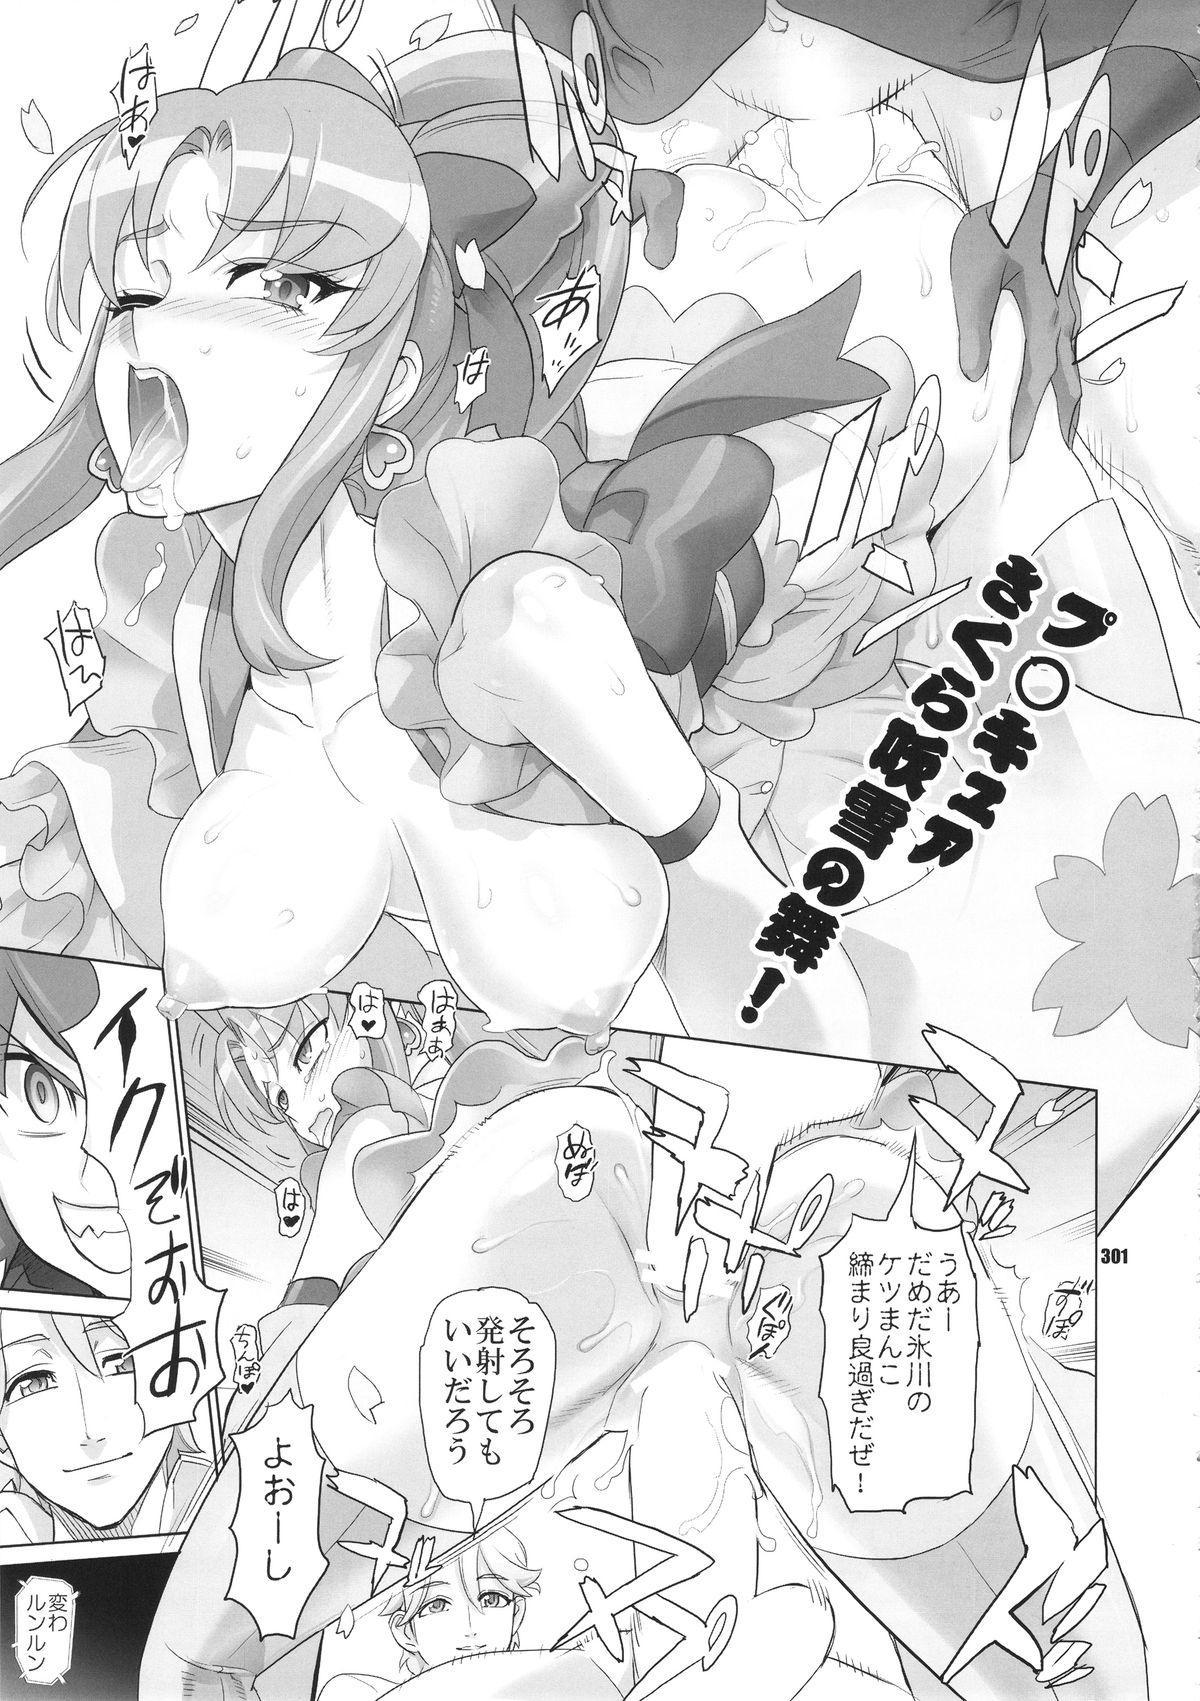 Inazuma Pretty Warrior 299